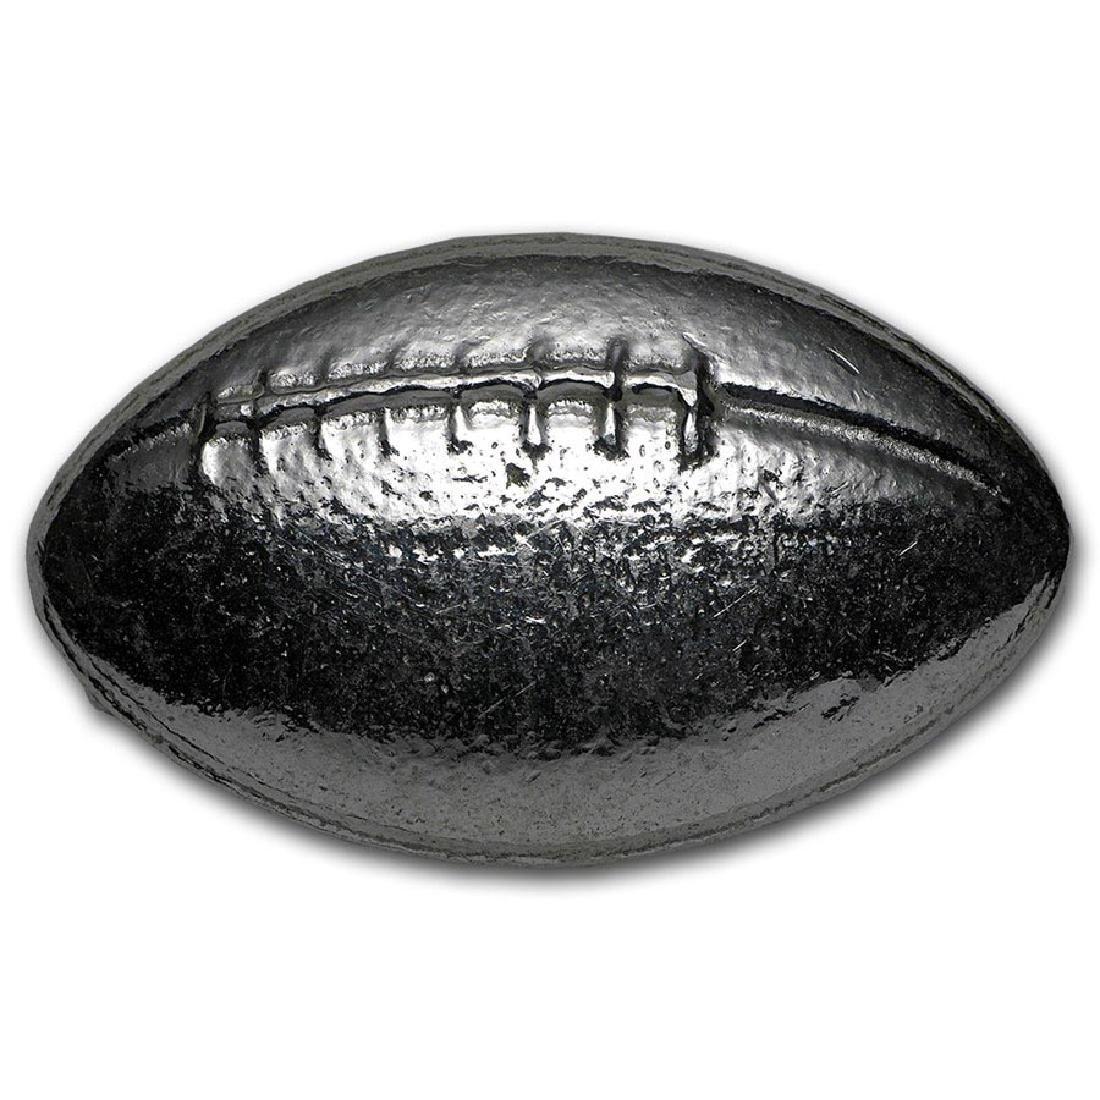 3 oz Silver Bar - Monarch Football